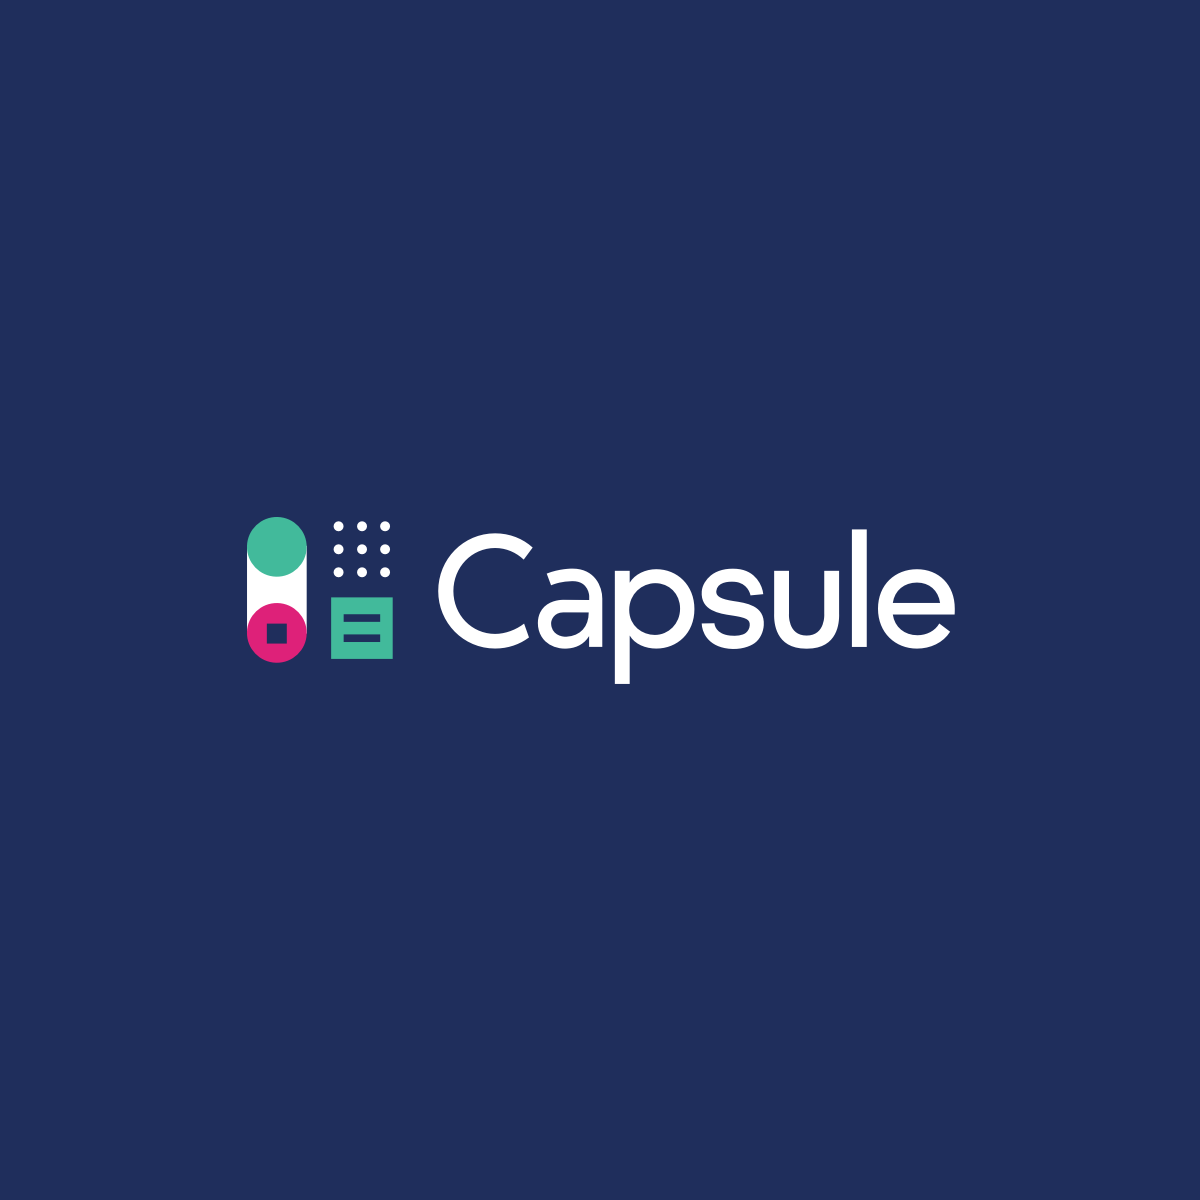 Capsule Crm Online Crm Software